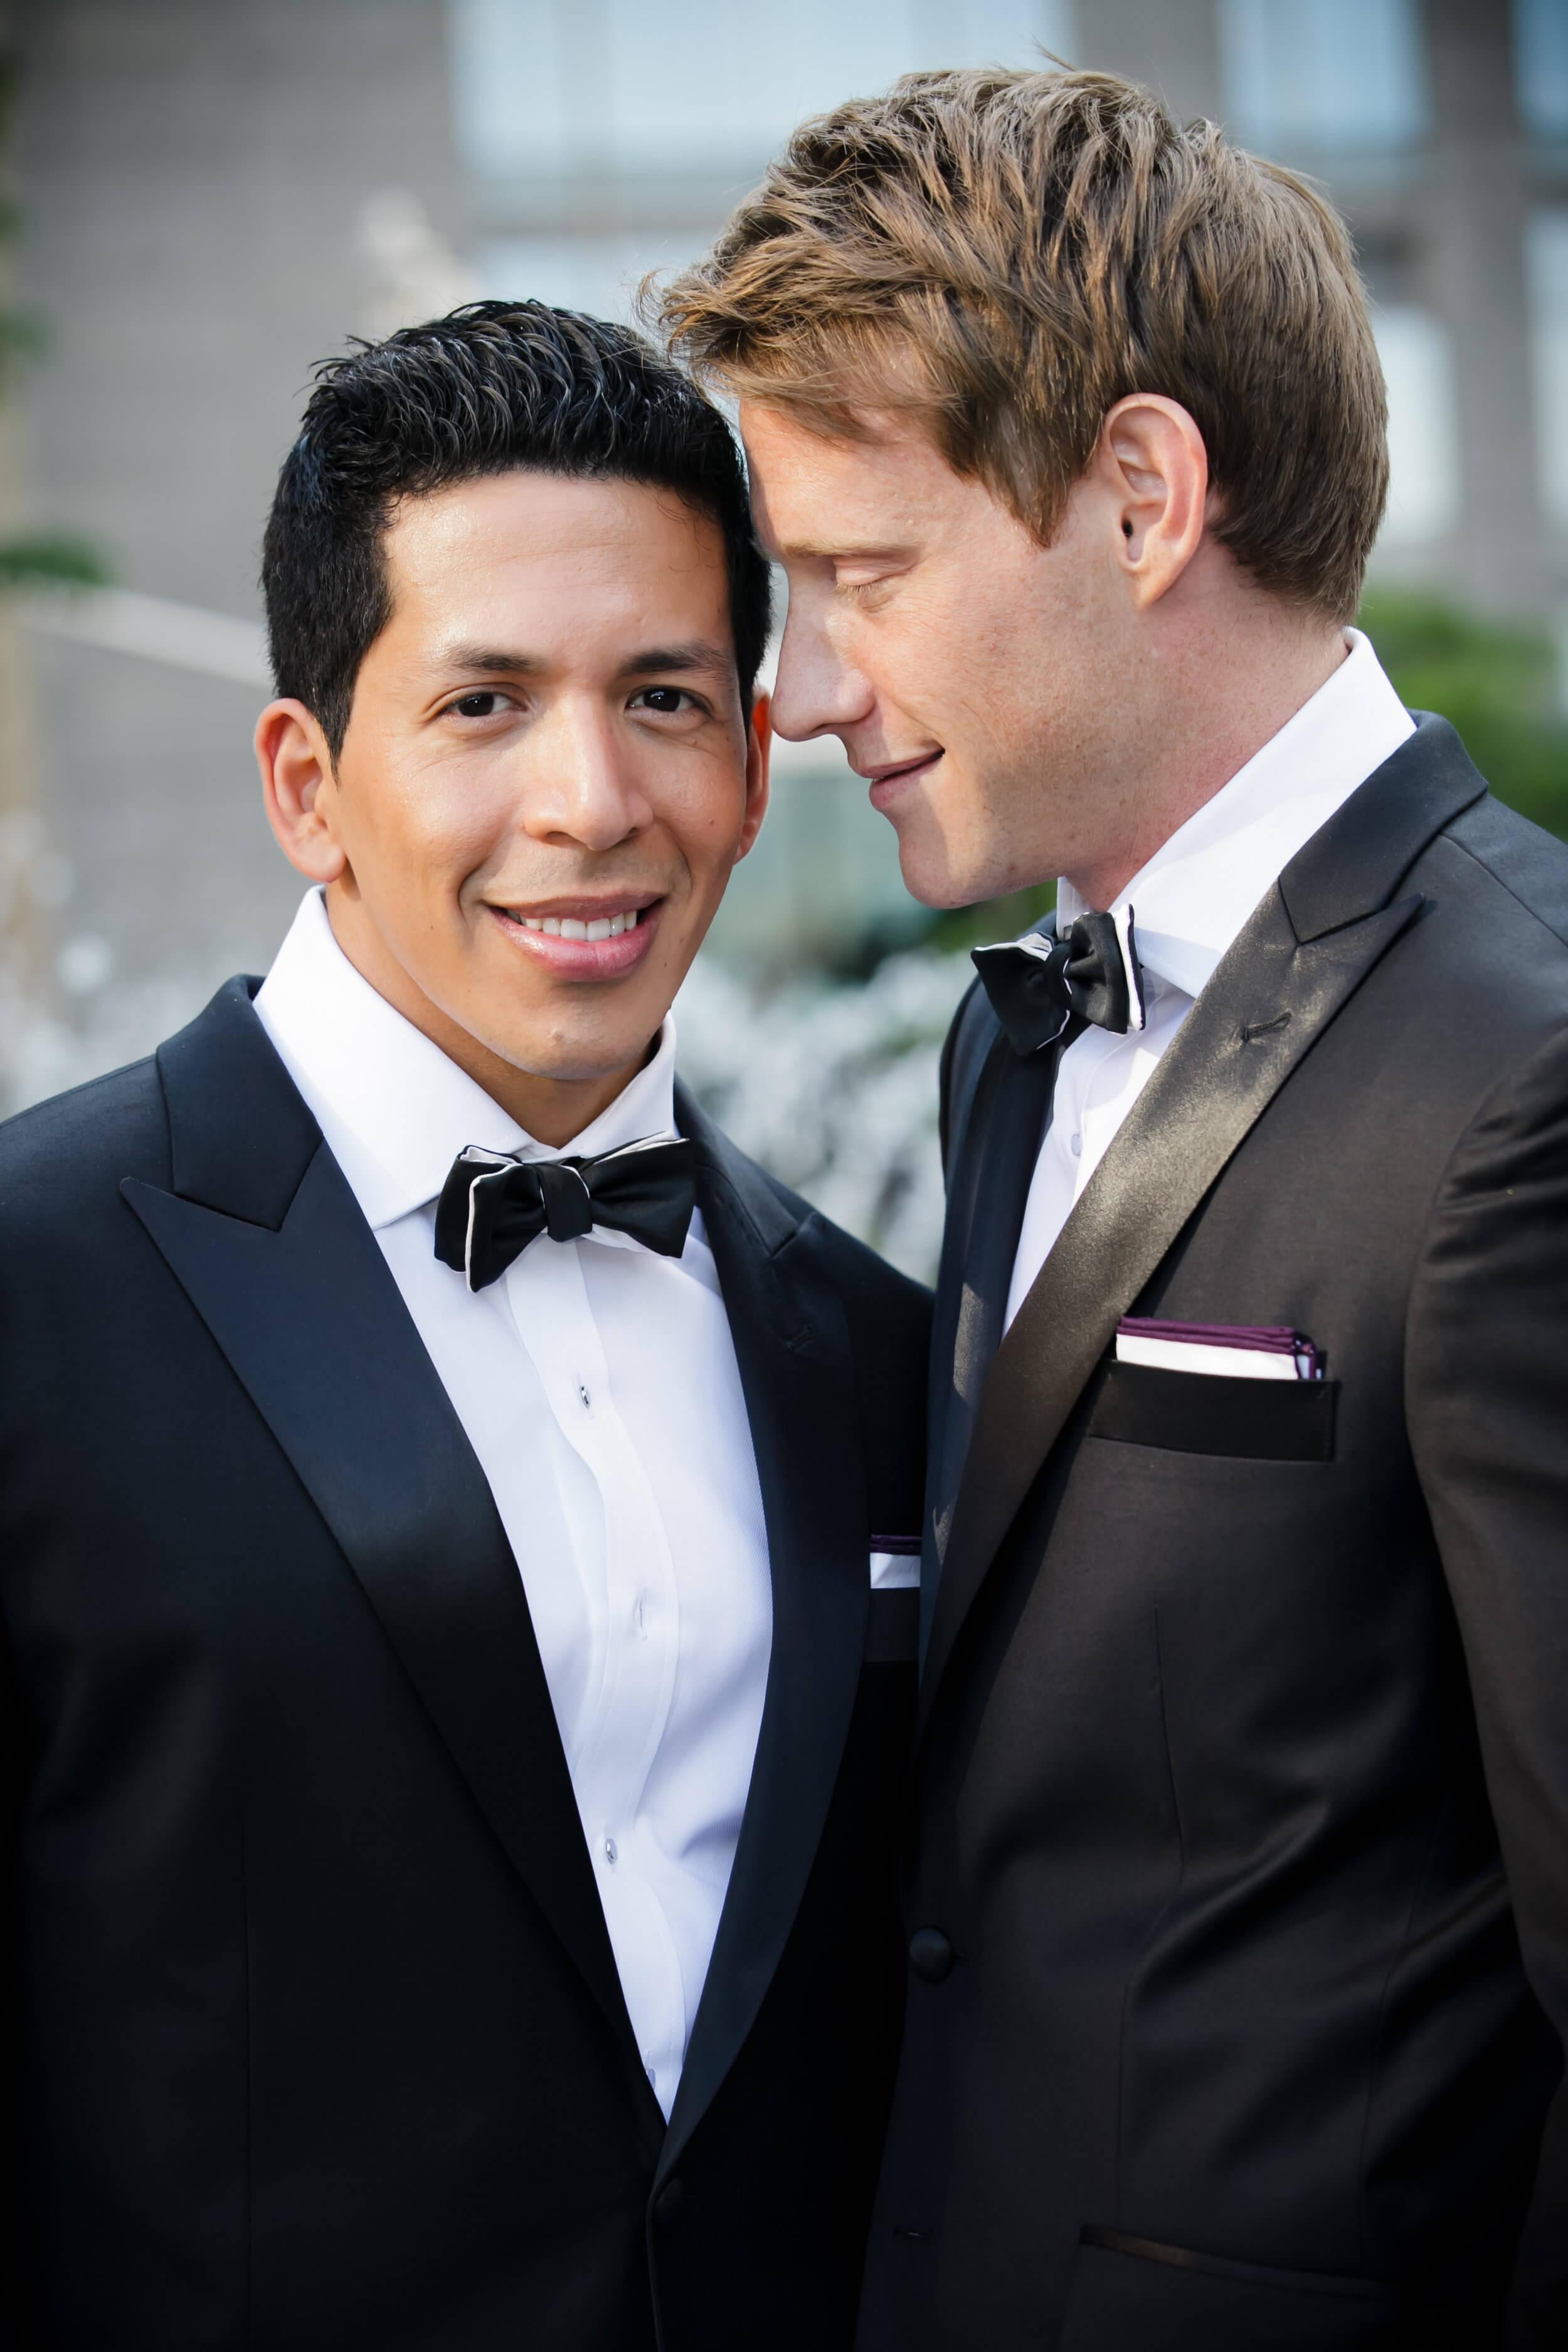 Wedding atThe Hudson Hotel New York City -